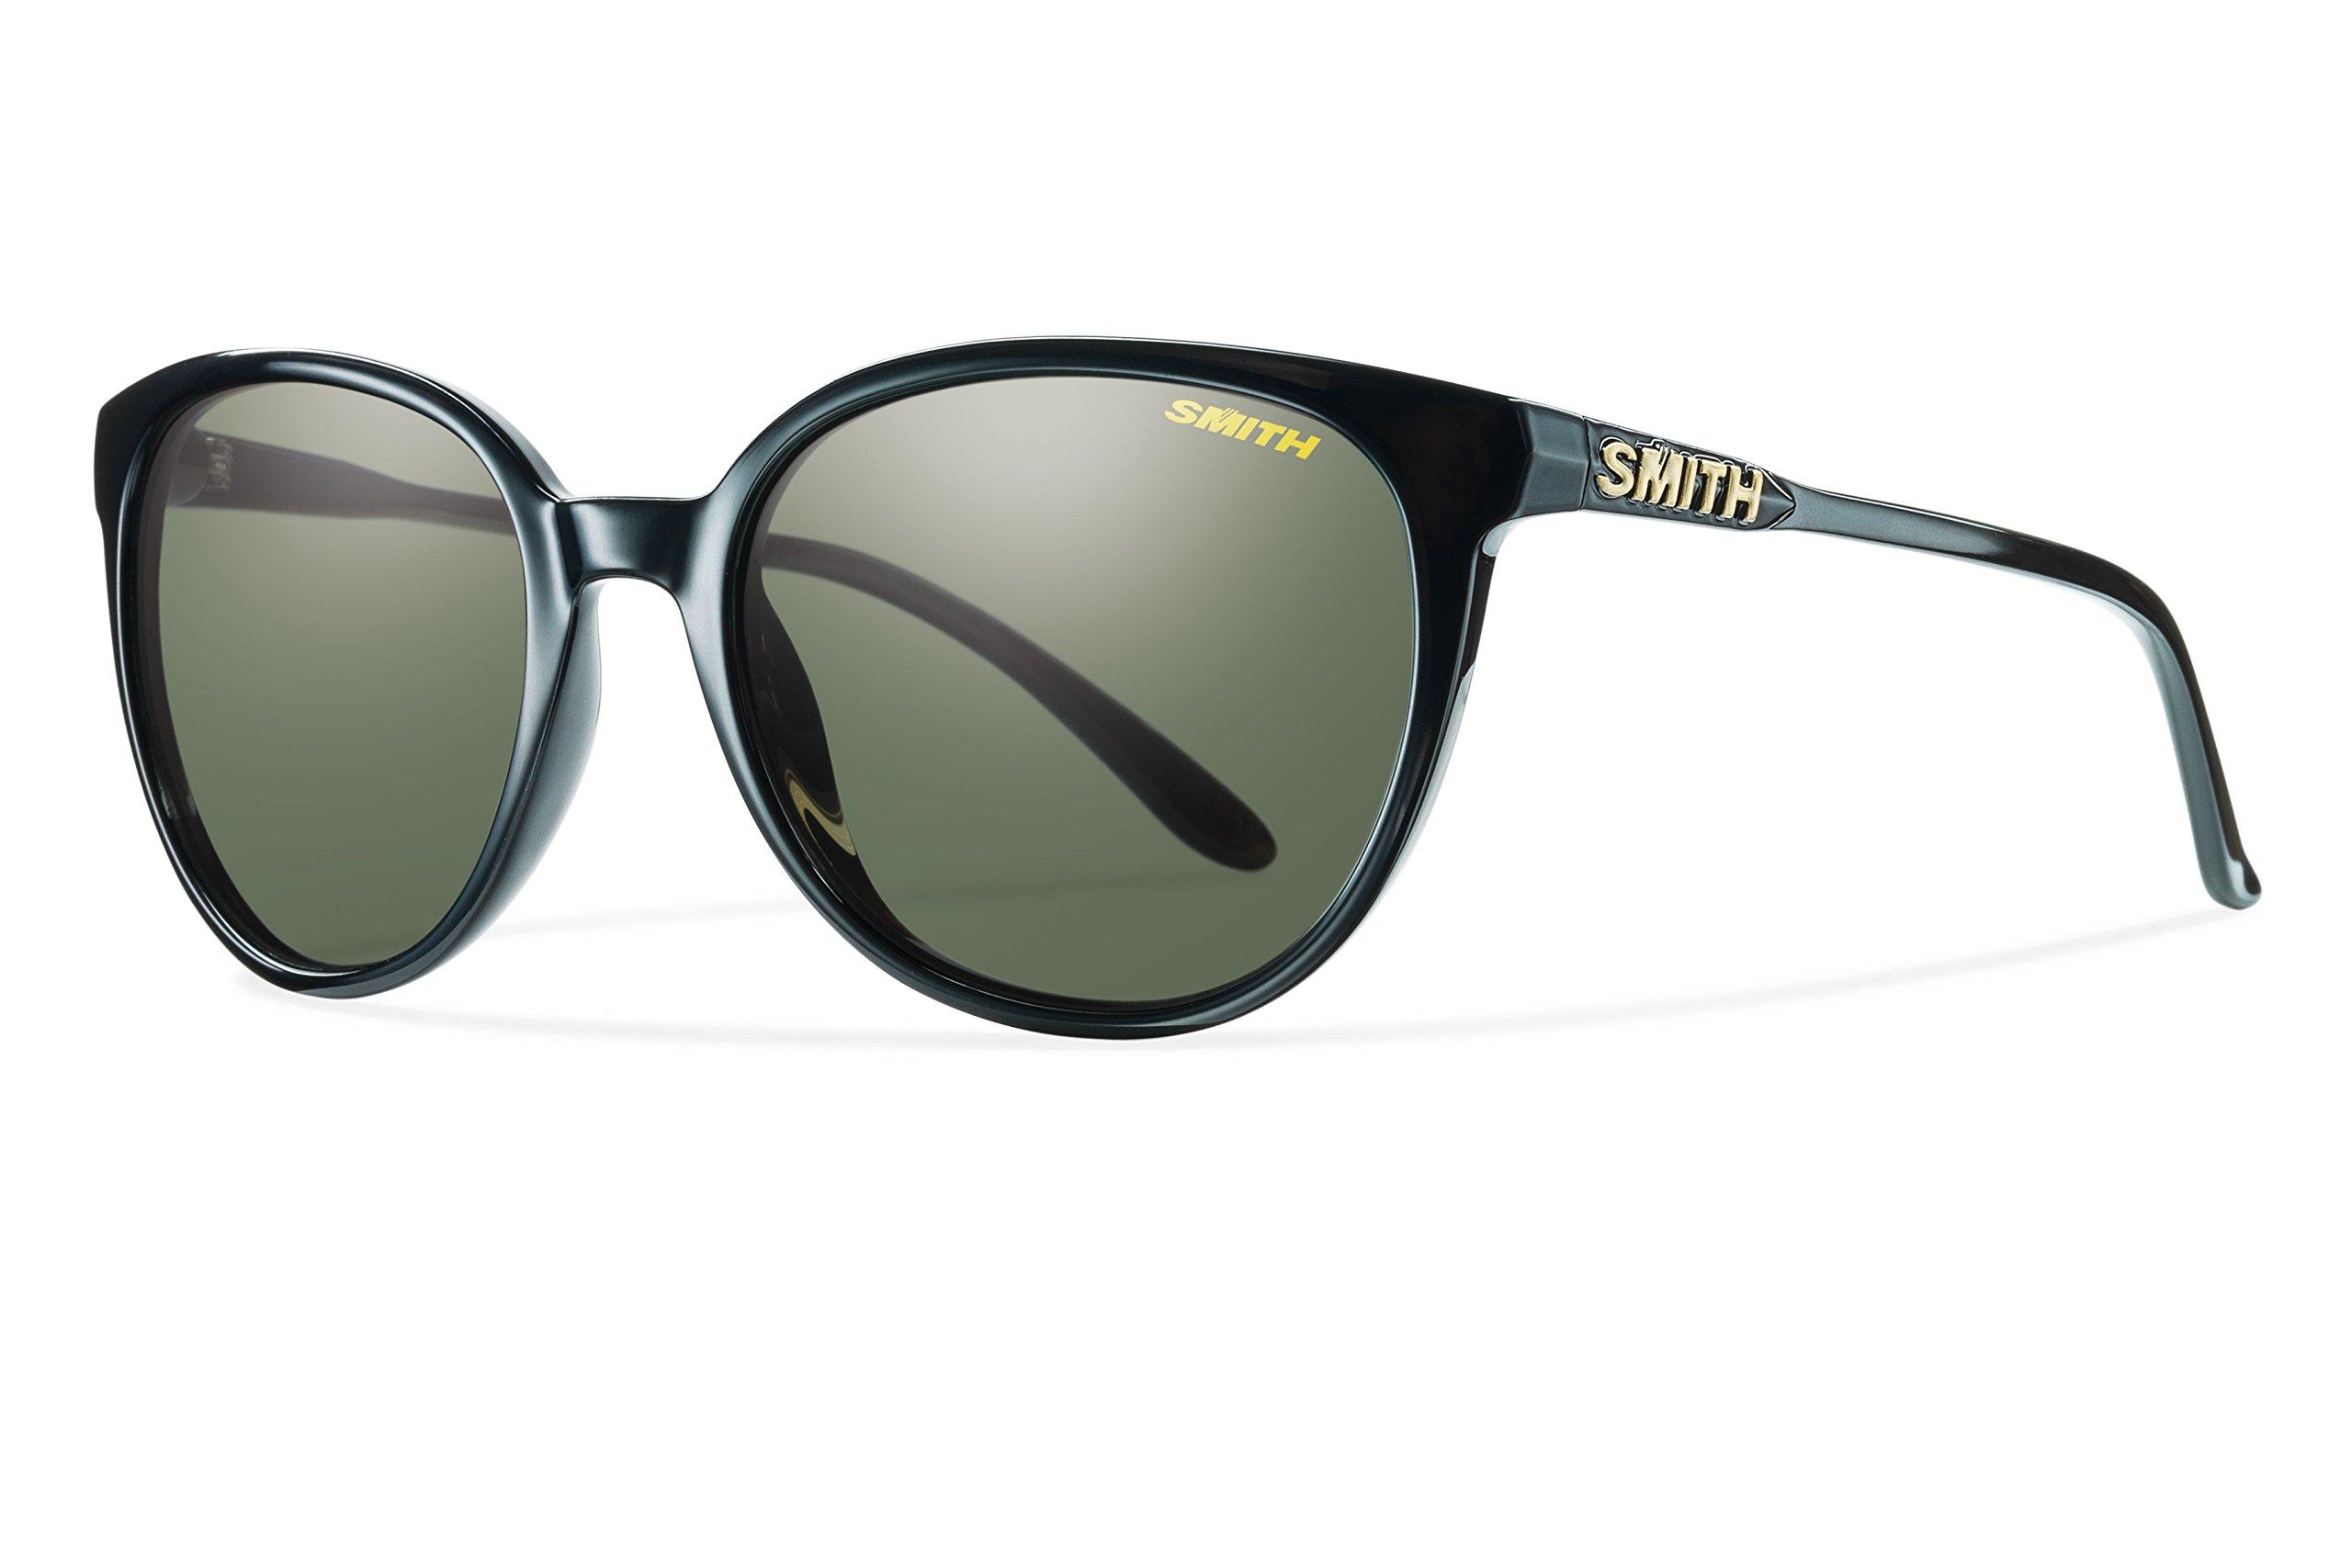 Smith Optics Smith Cheetah Sunglasses, Black Frame, Carbonic Polarized Gray green Lens, Gray green